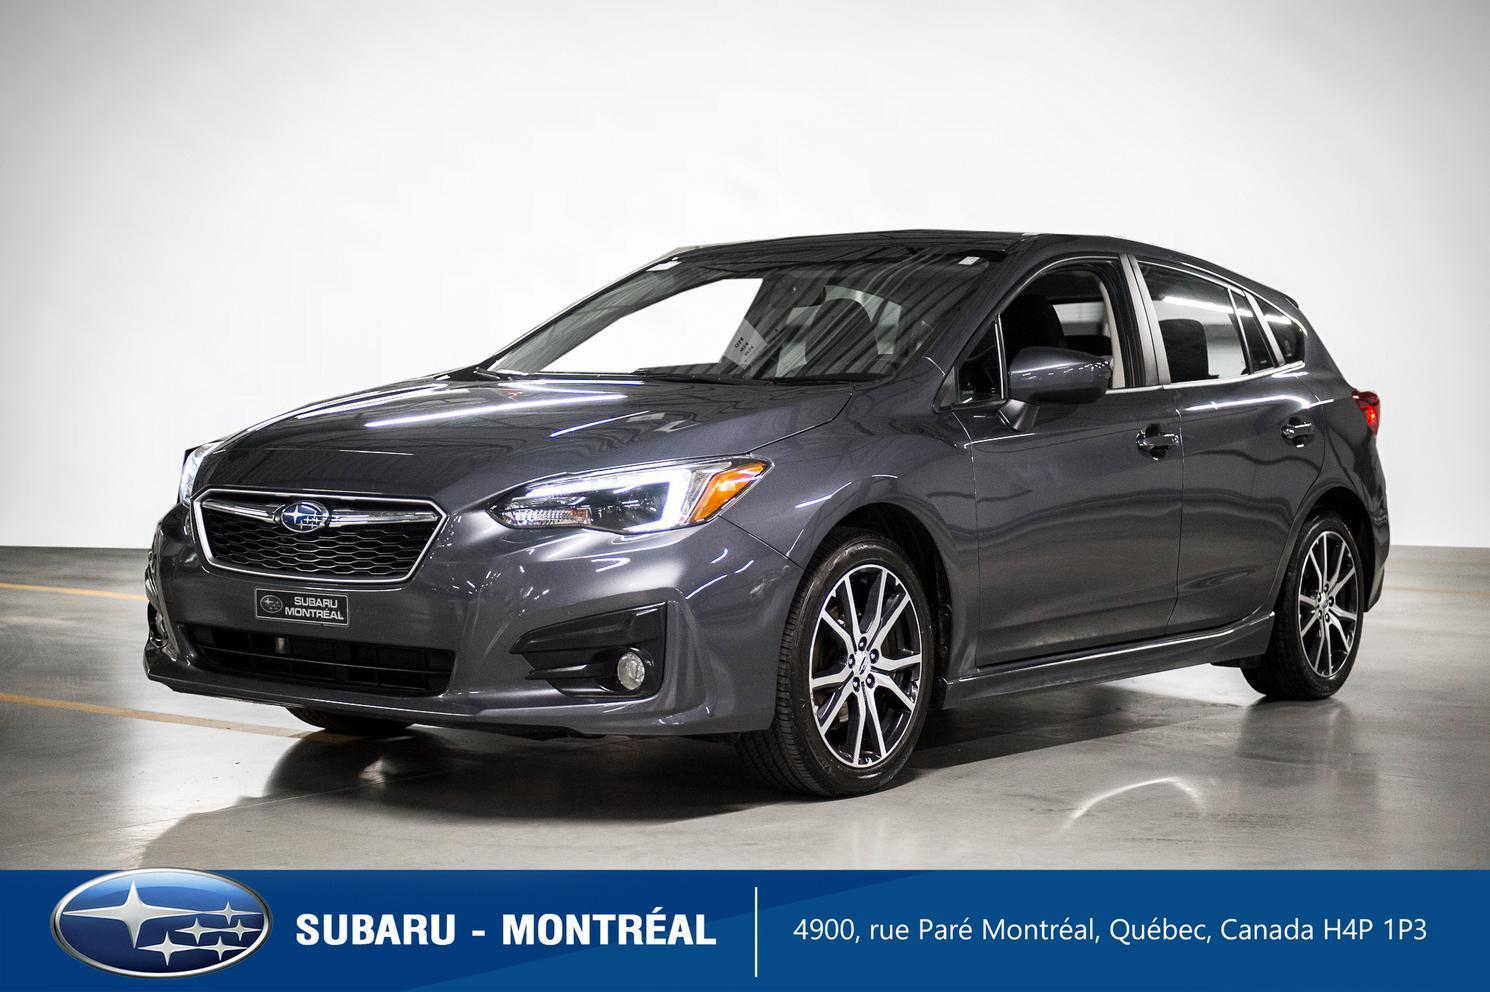 2018 Subaru Impreza Sport Hatchback